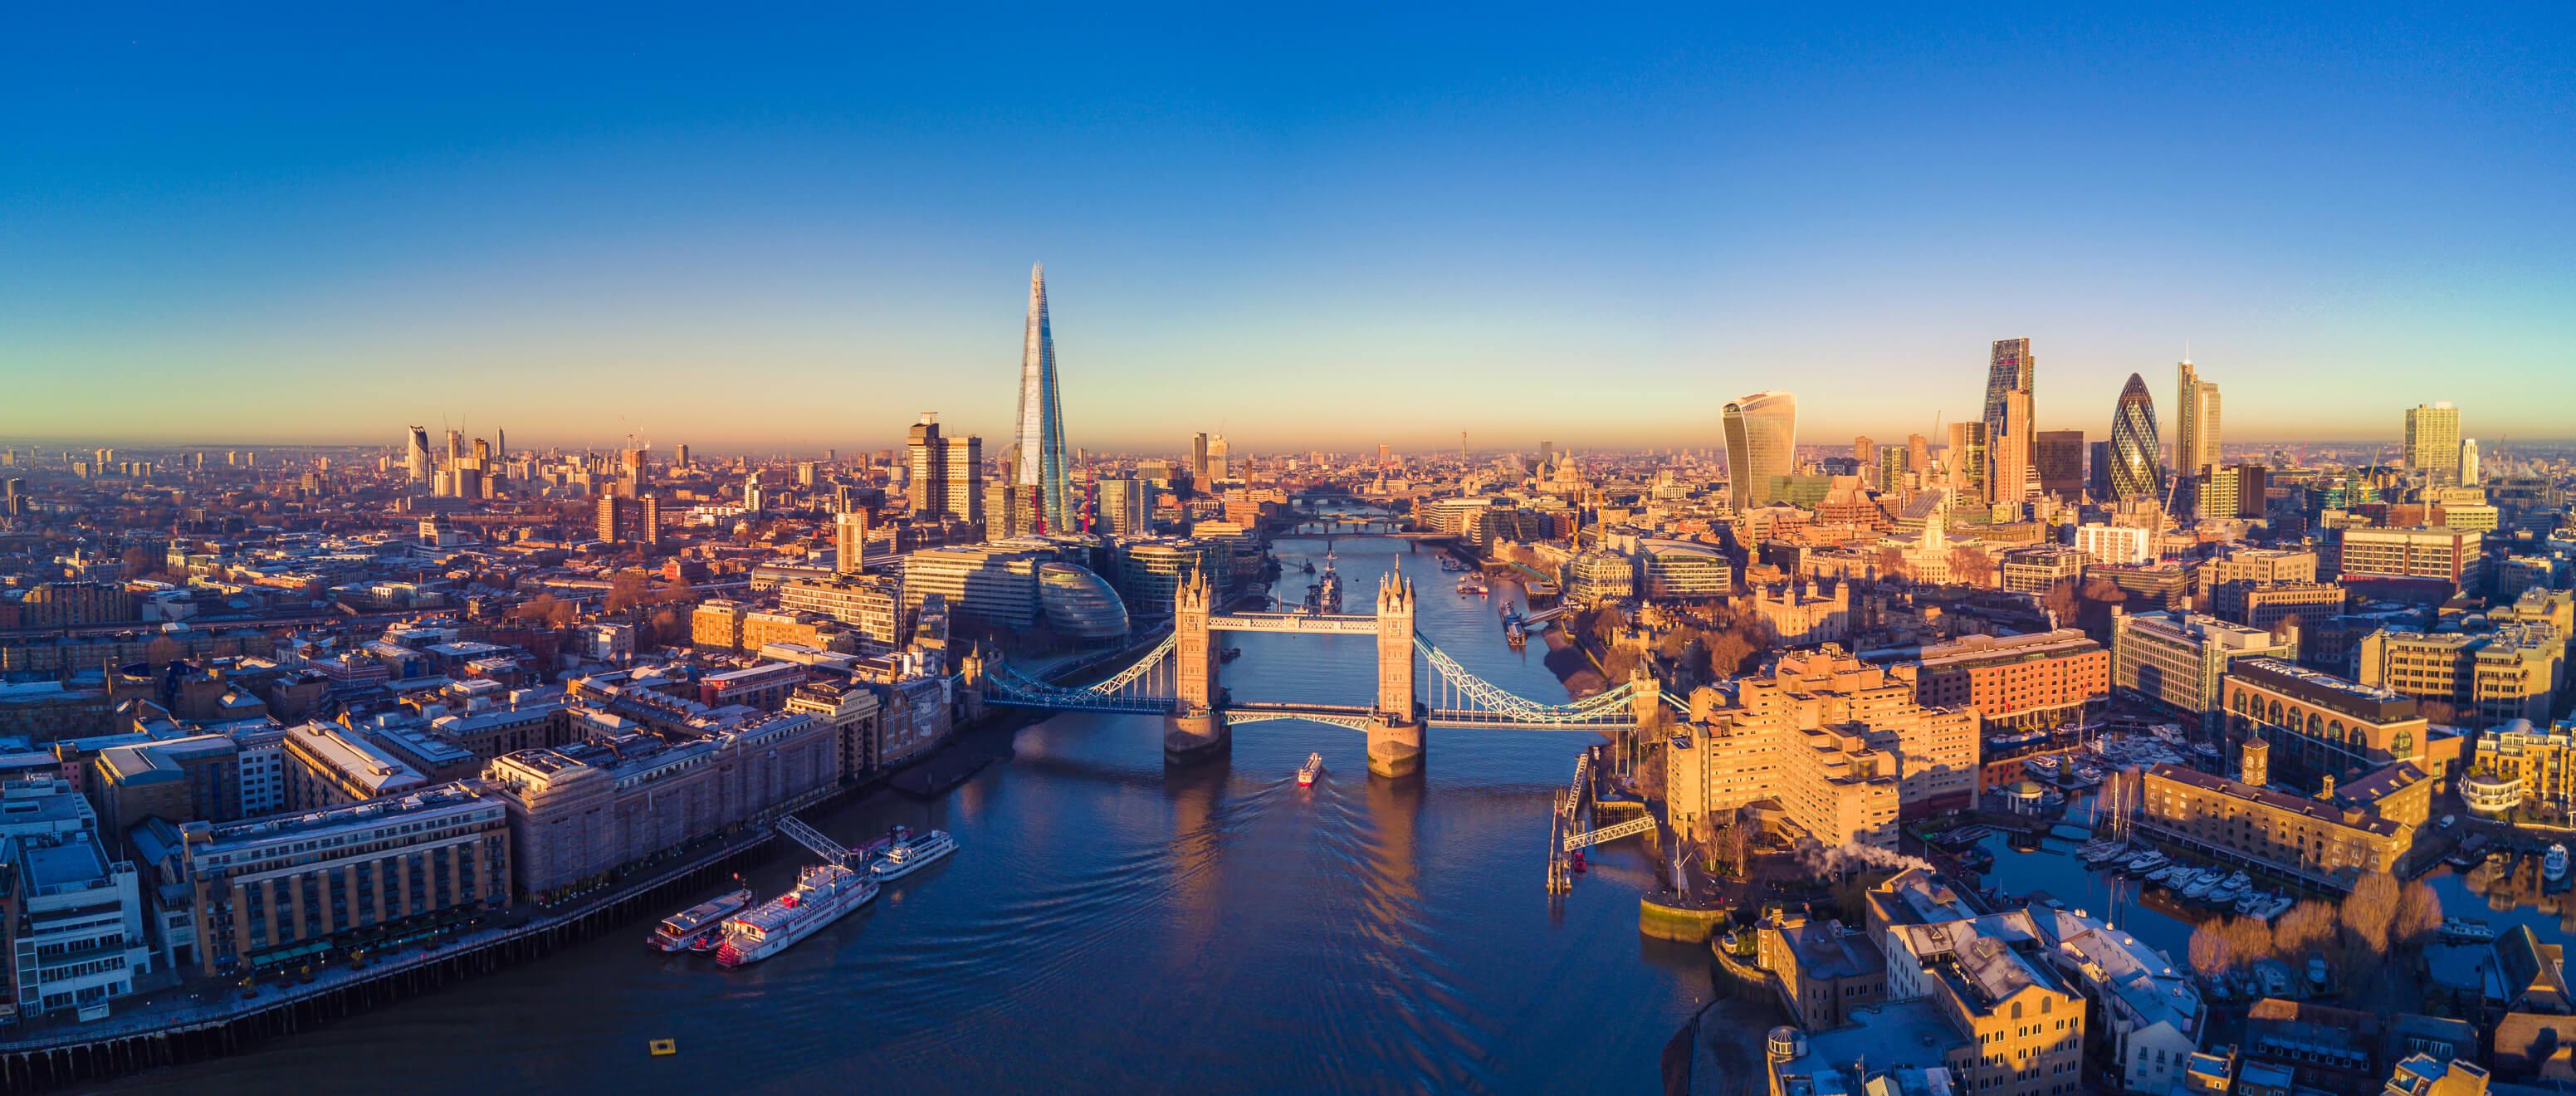 London City Guide - Globehunters